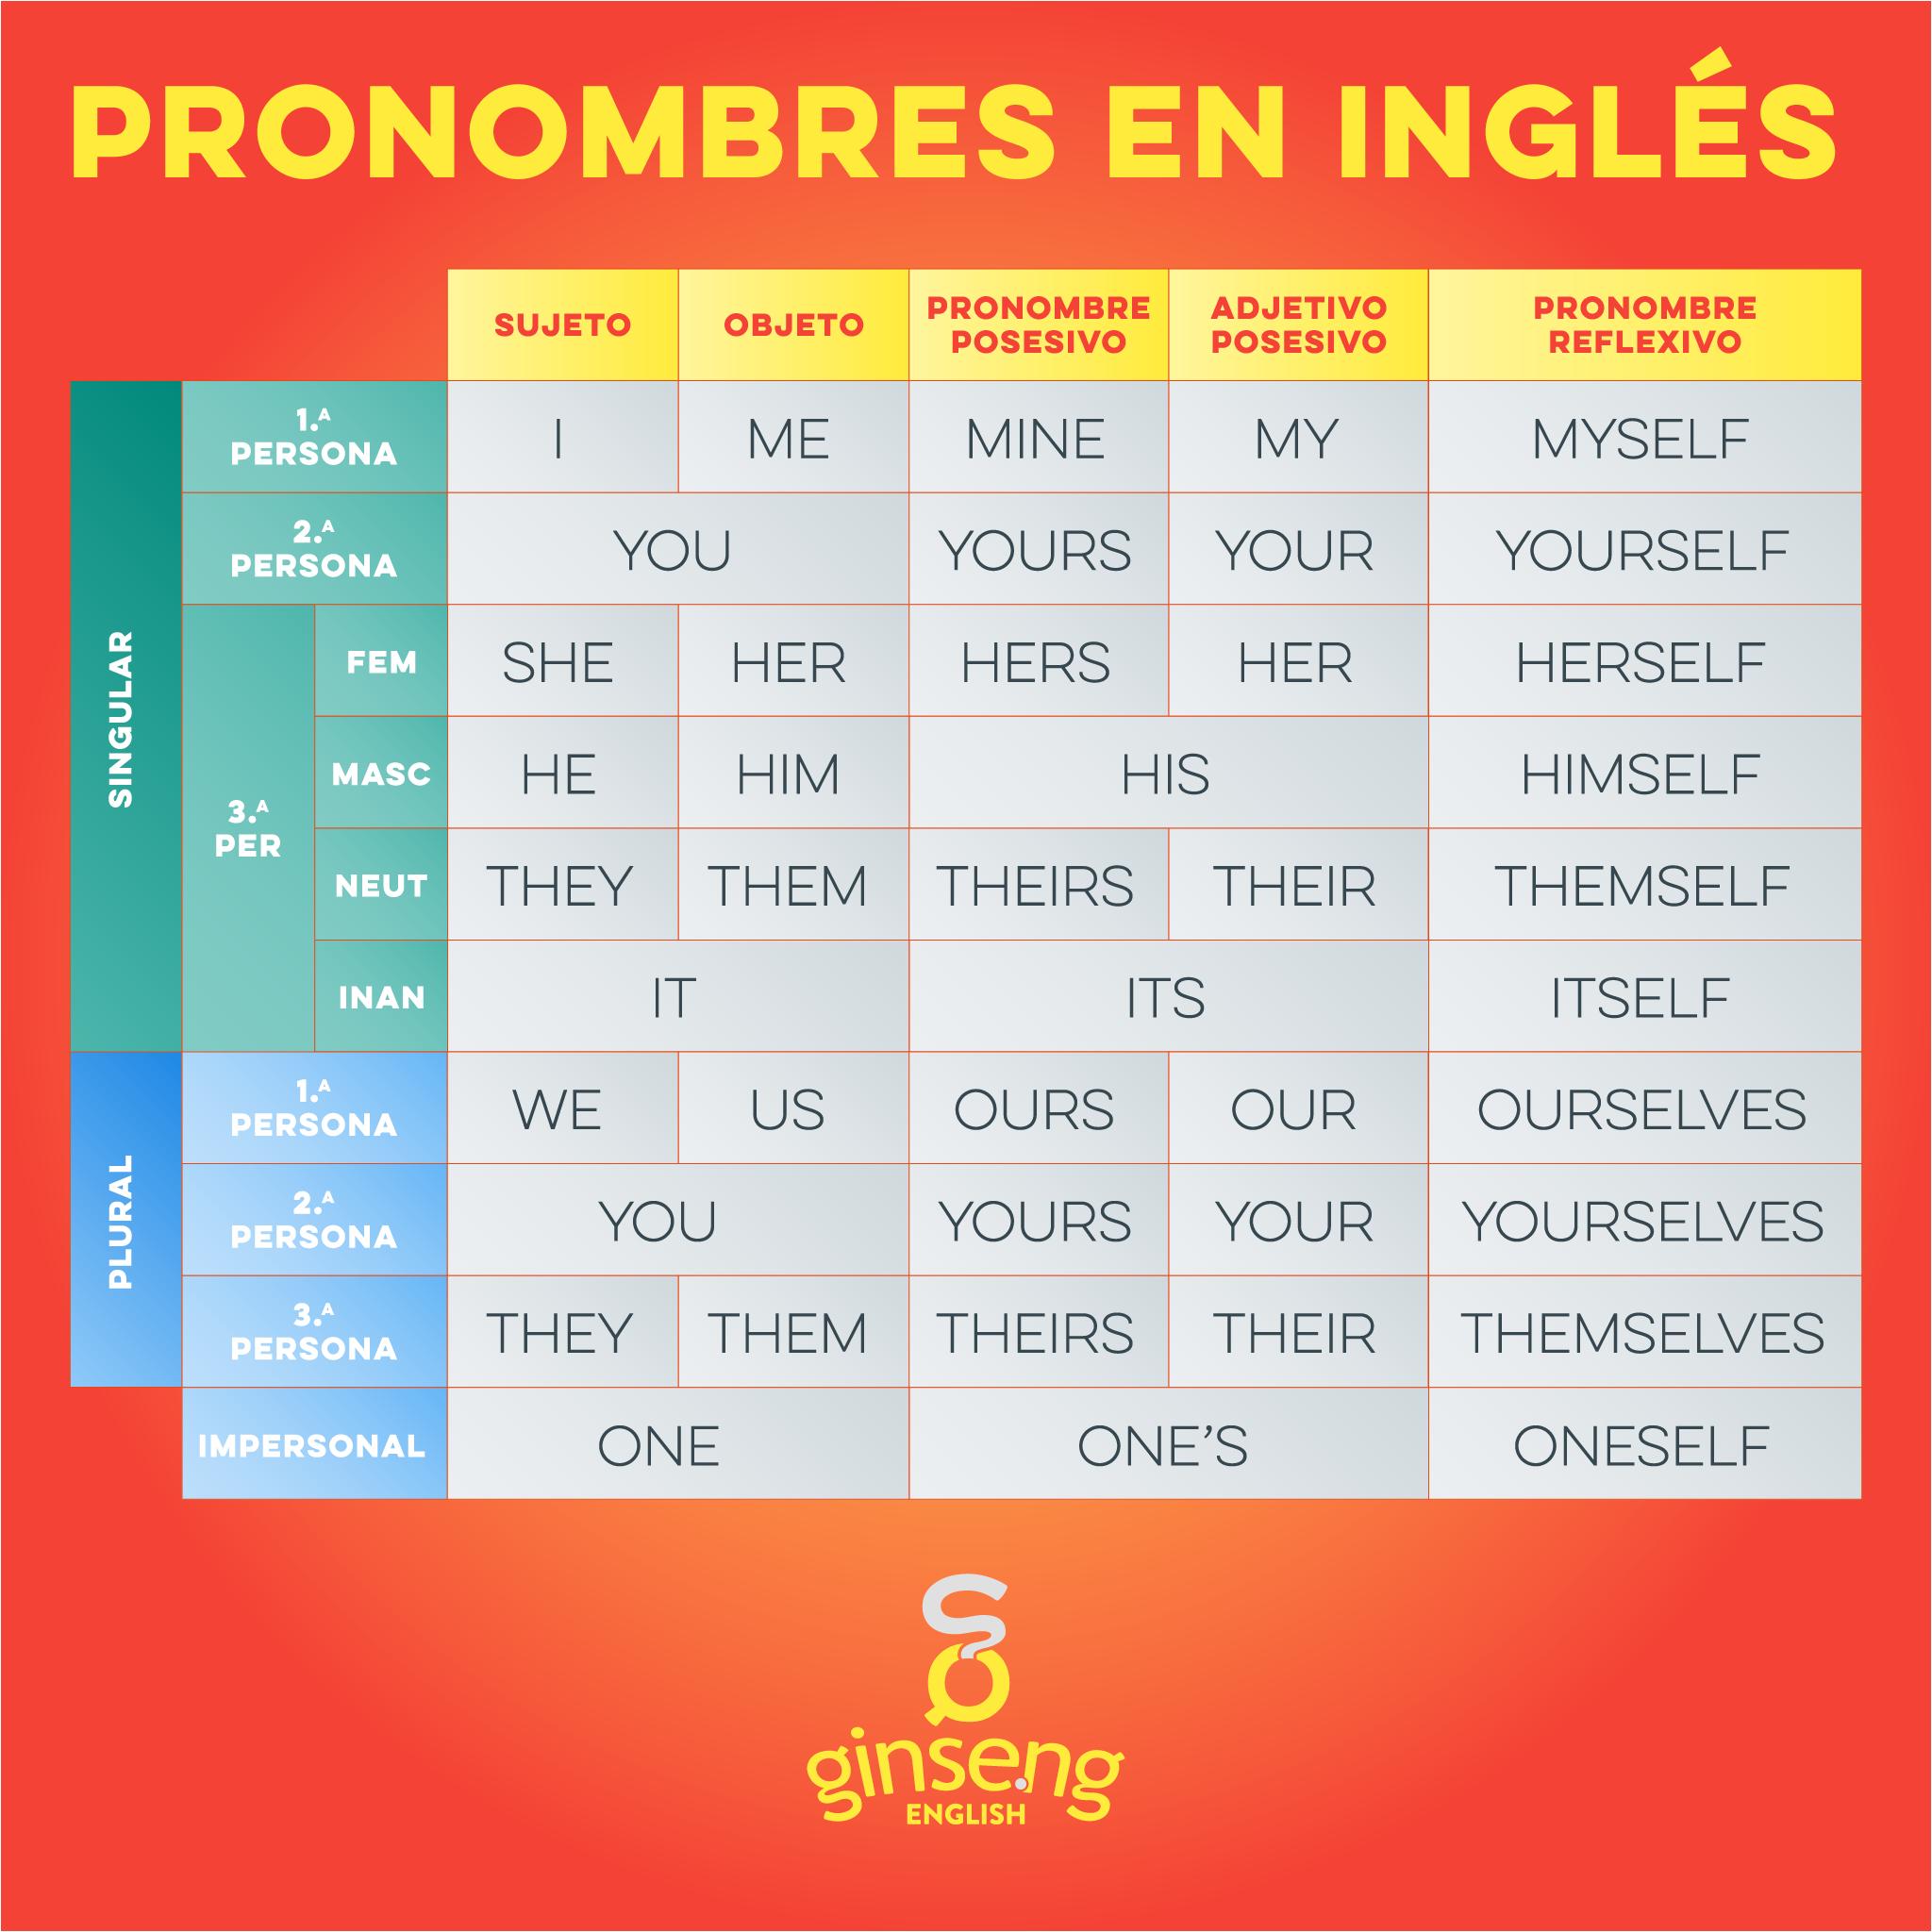 English Pronouns in Spanish